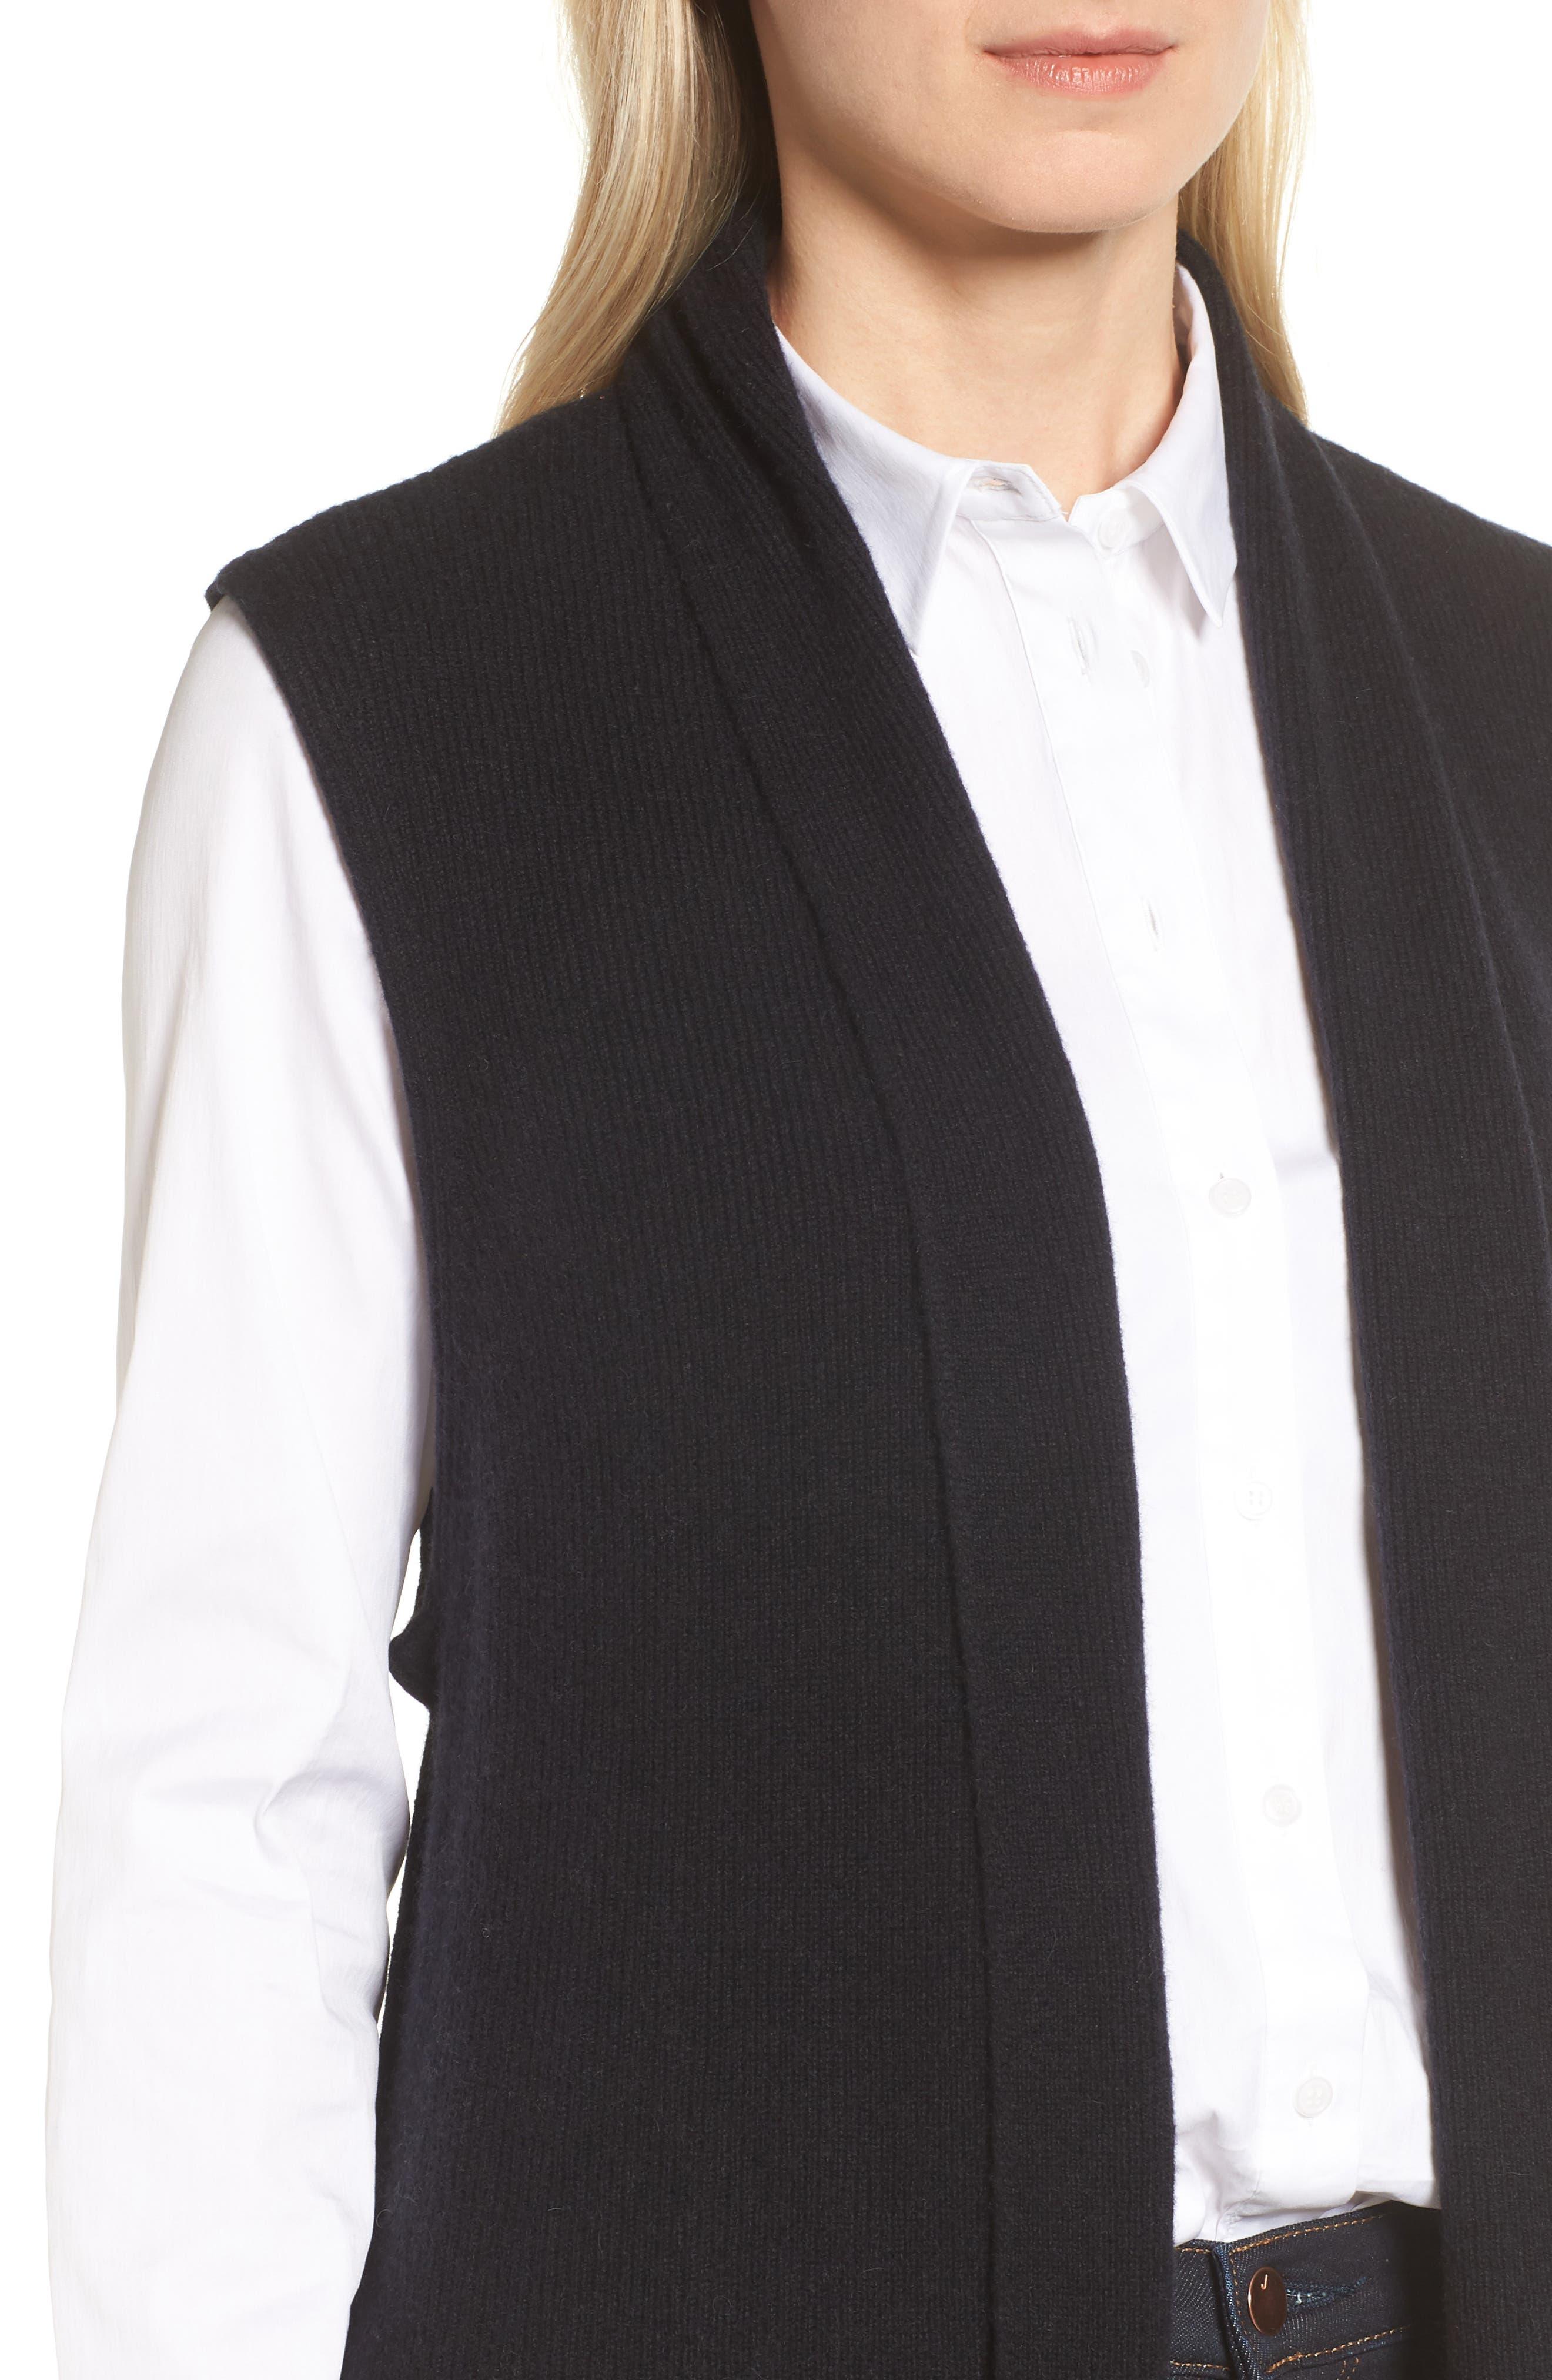 Ribbed Cashmere Vest,                             Alternate thumbnail 4, color,                             001